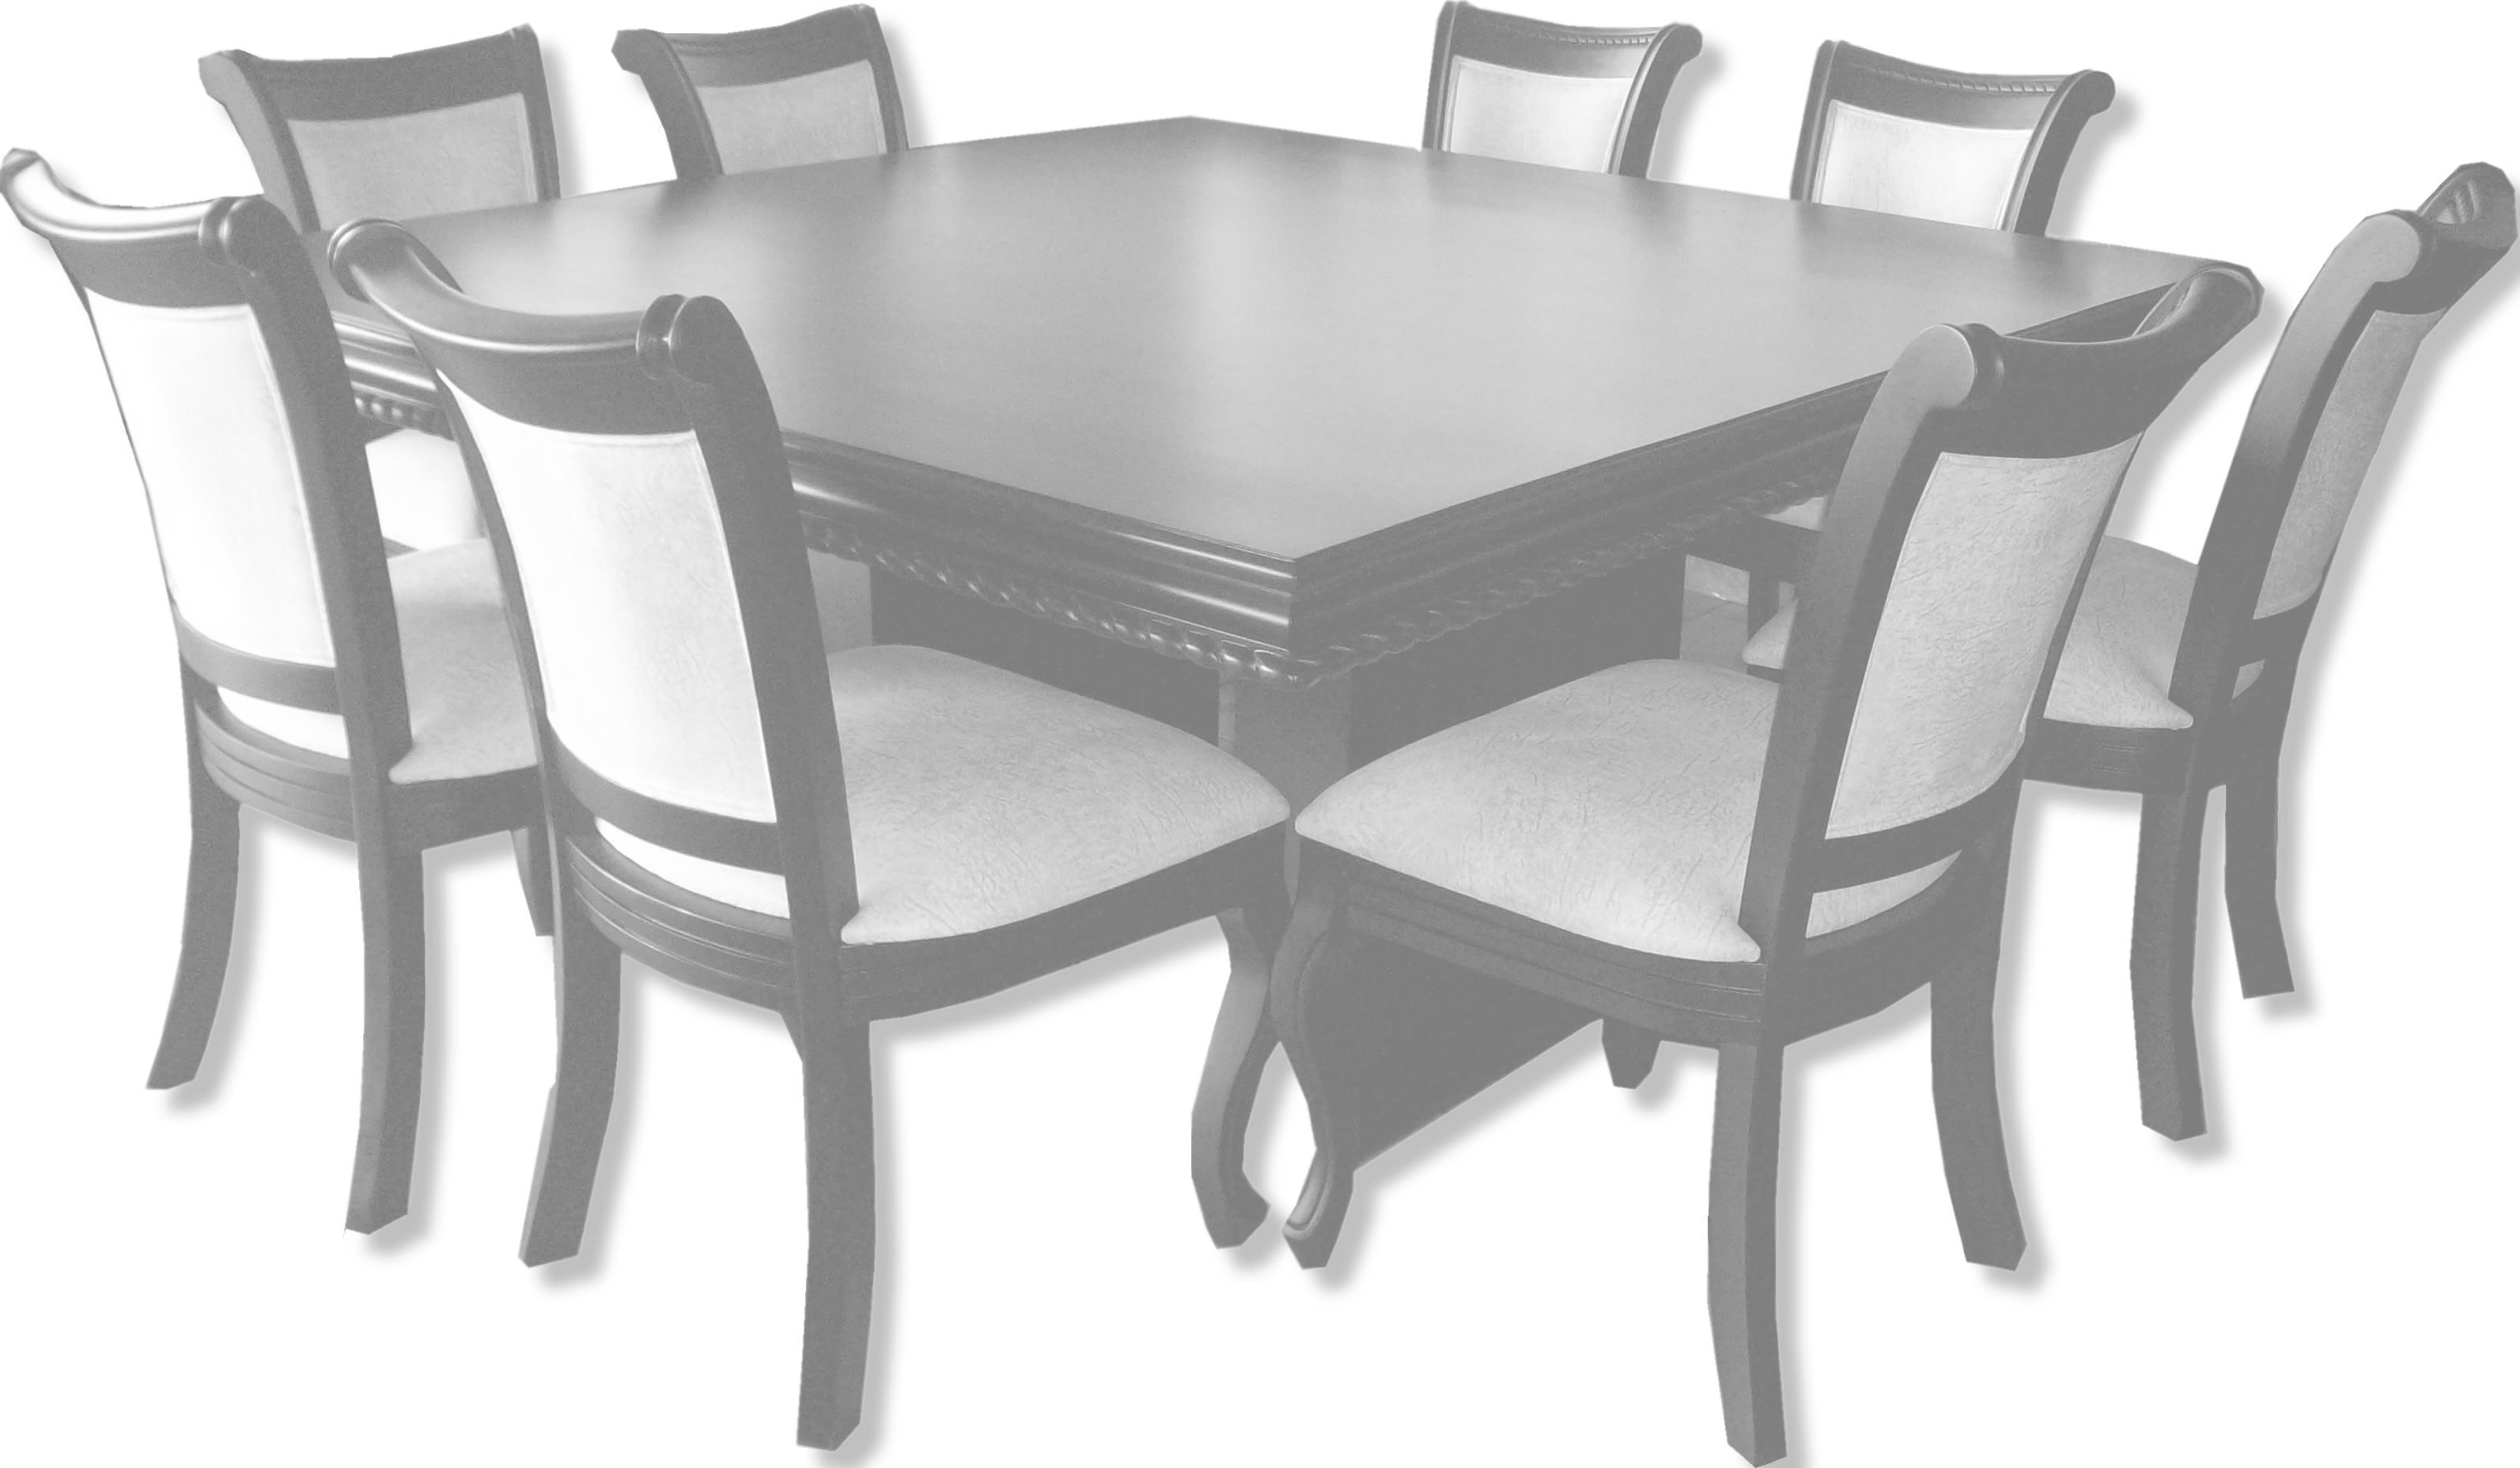 Top venden muebles de wallpapers - Muebles modernos de sala ...